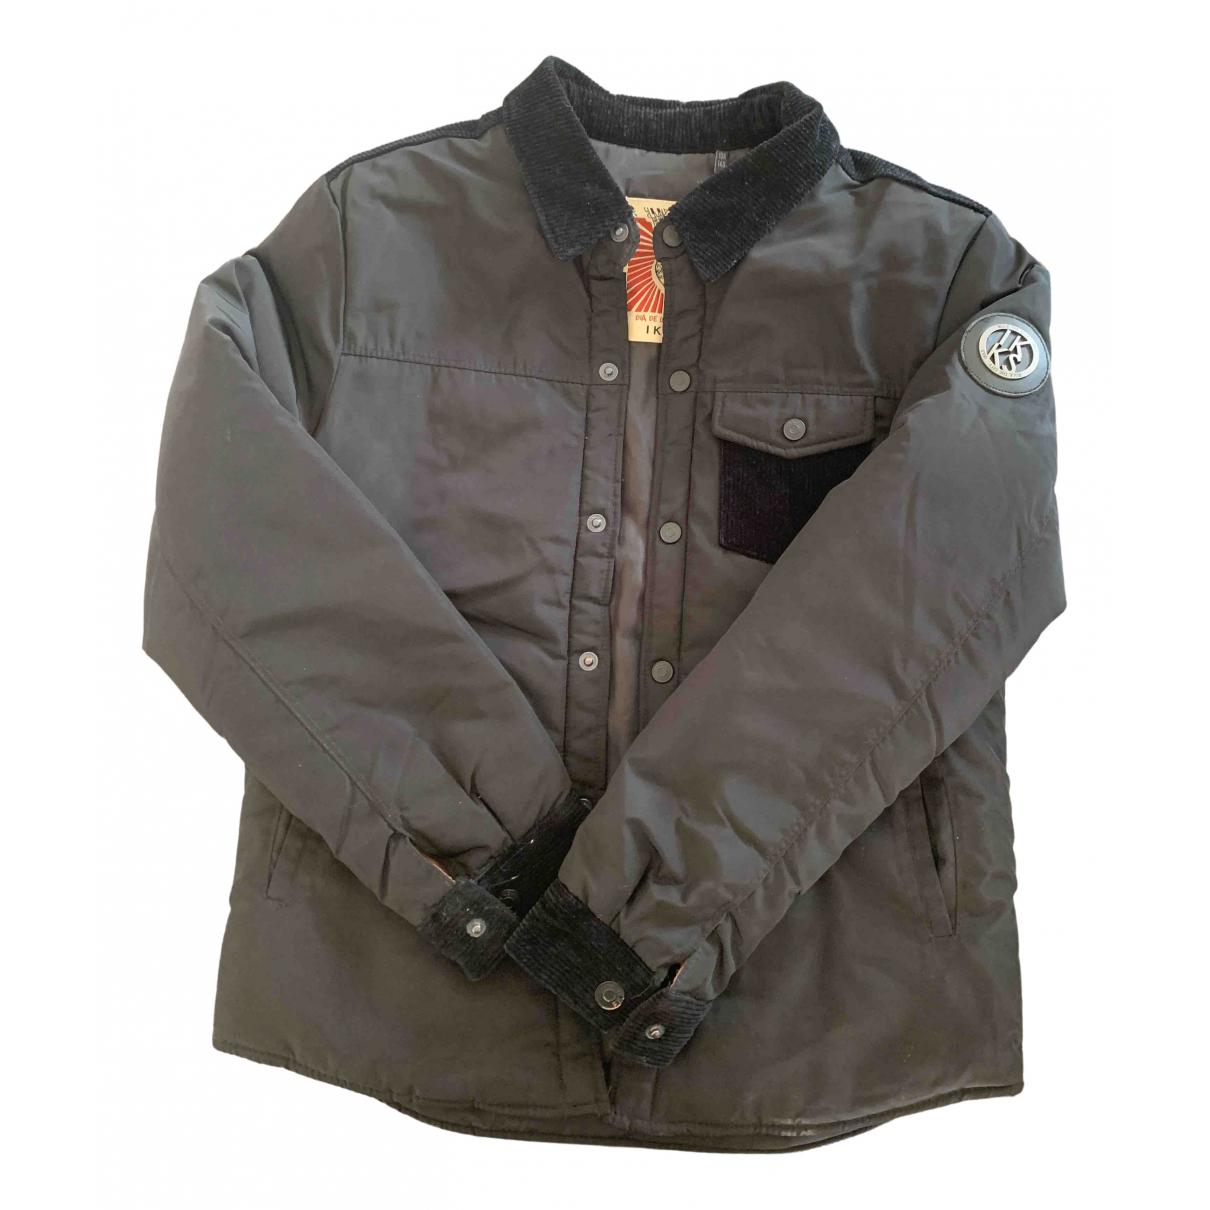 Ikks N Black jacket & coat for Kids 10 years - up to 142cm FR